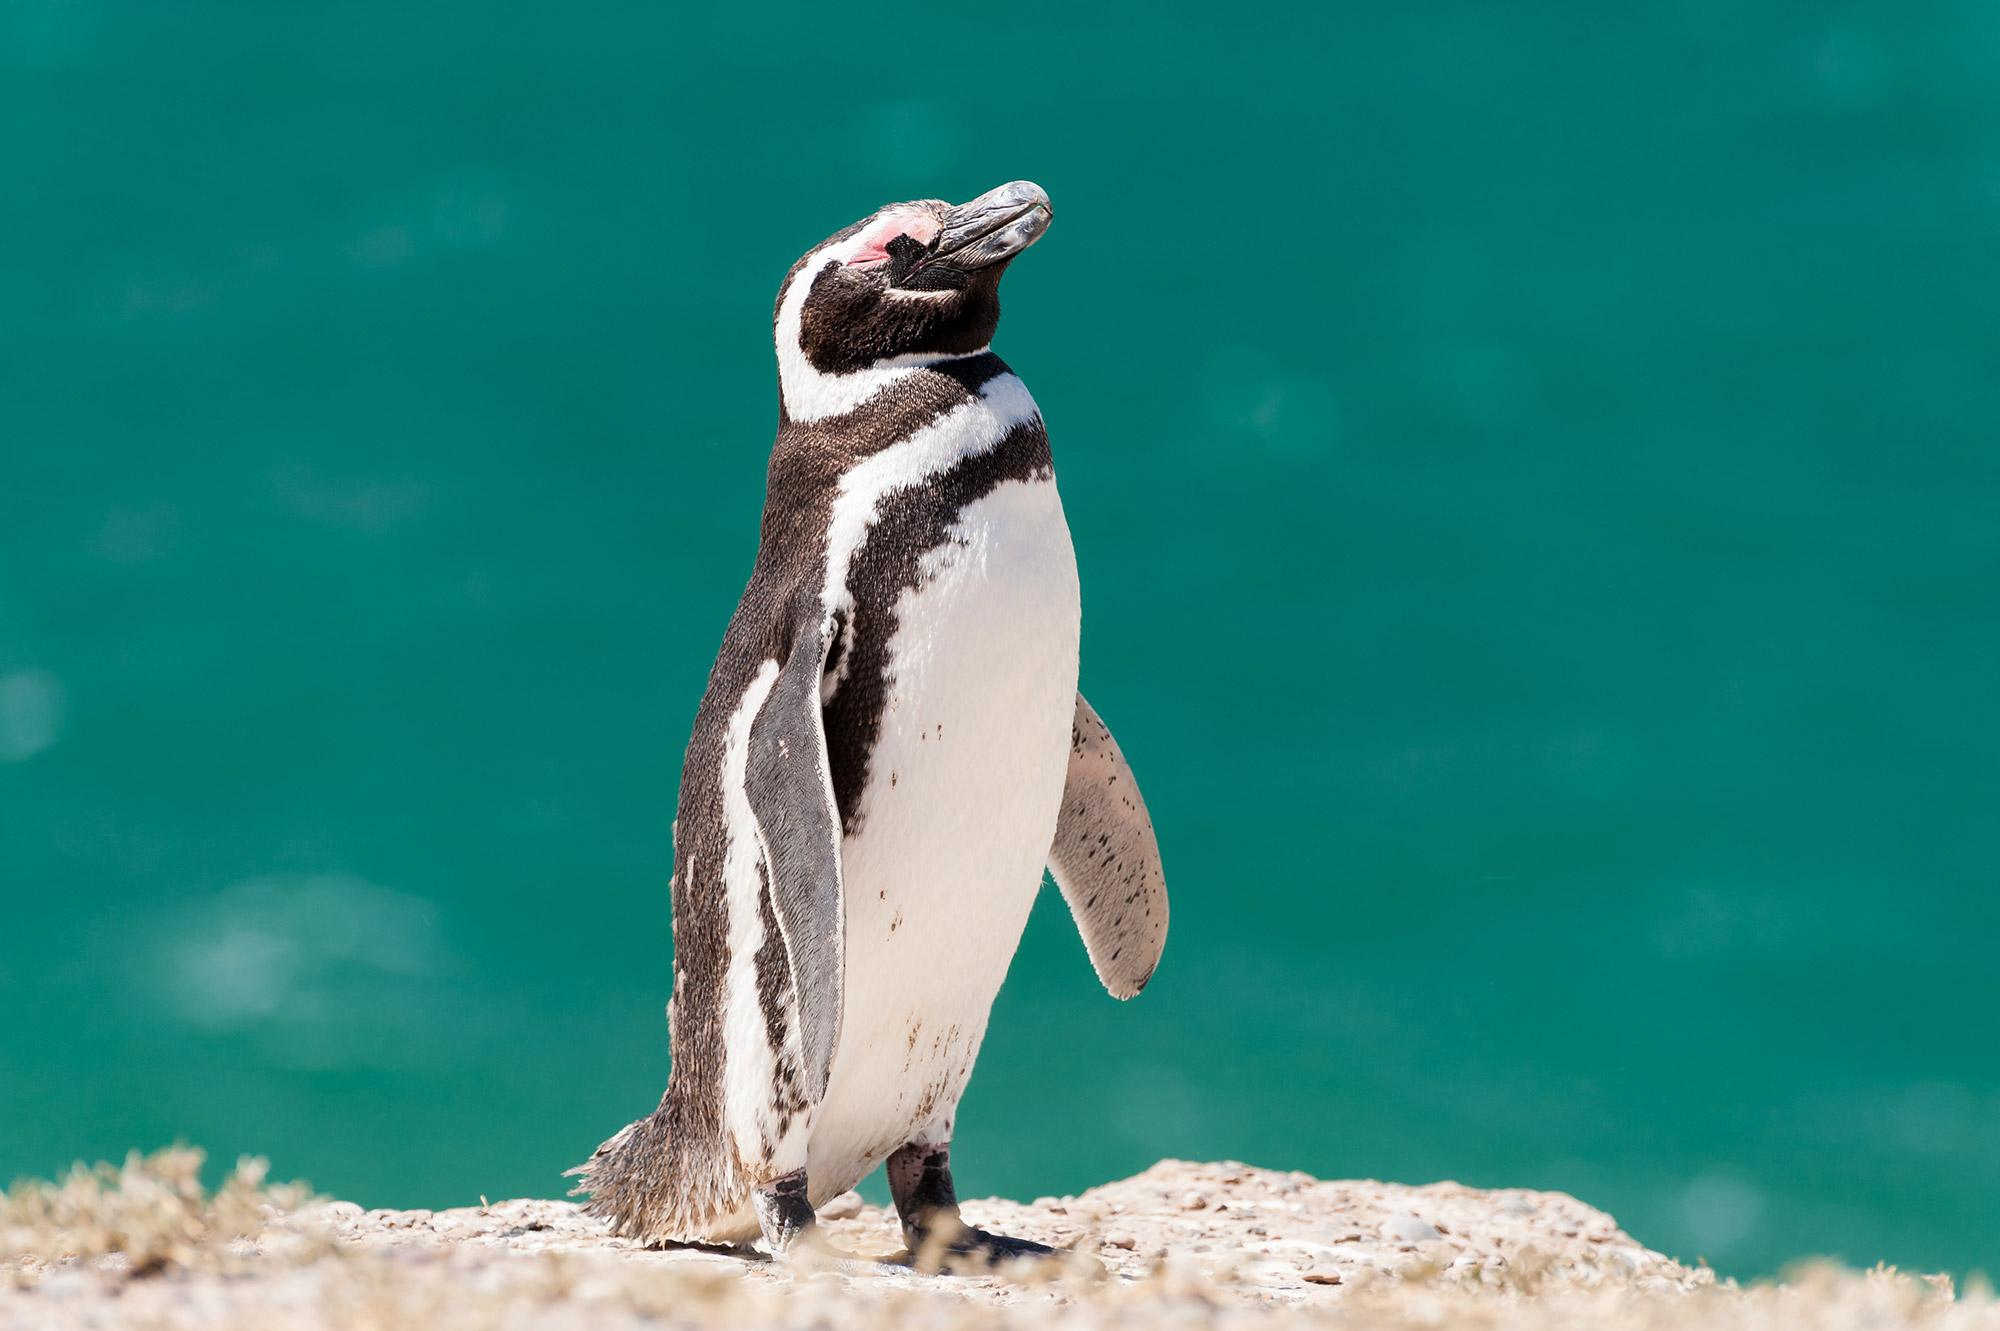 Pinguin_Peninsula-Valdes